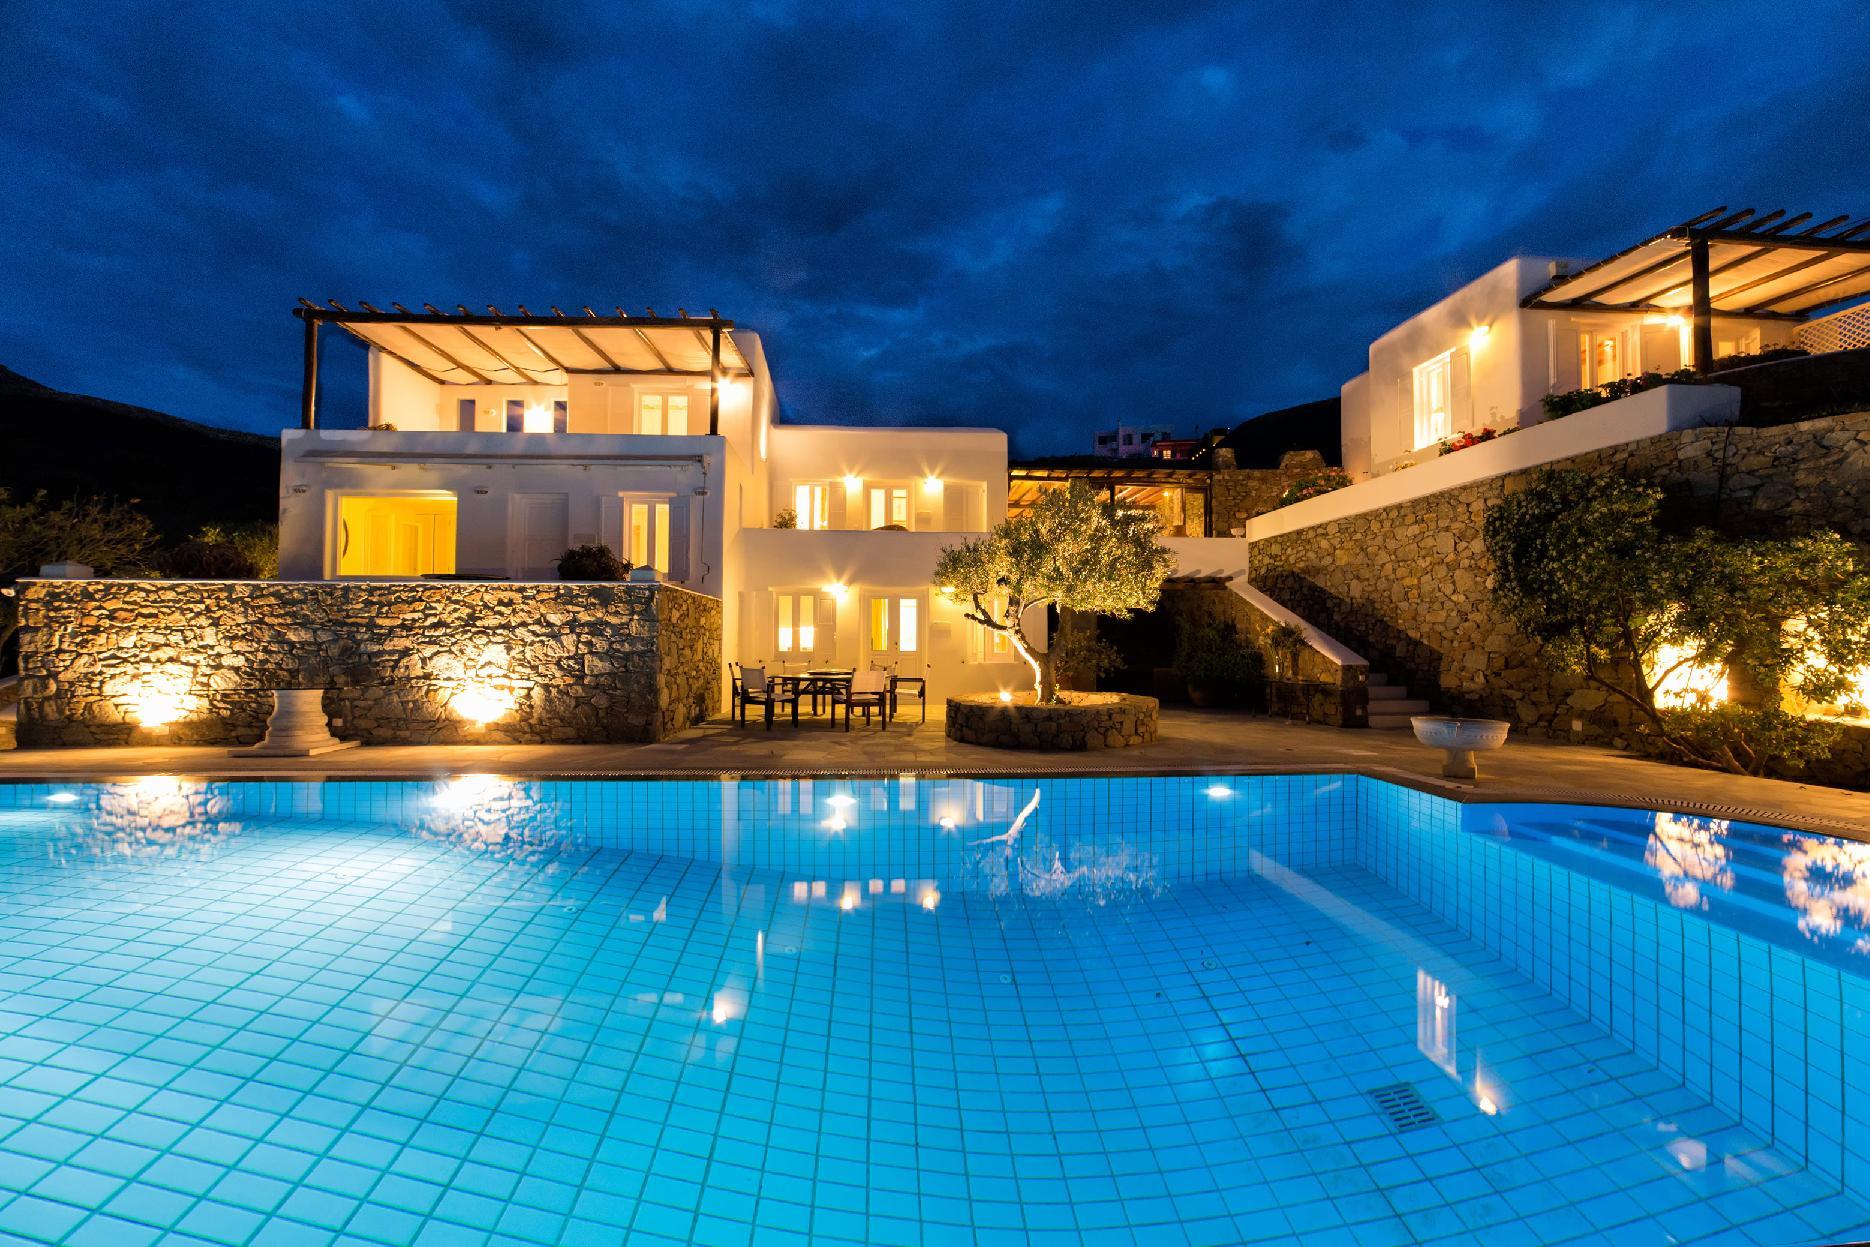 Apartment HOUSE OF THE SUN The Galaxy Mykonos villa photo 1411920